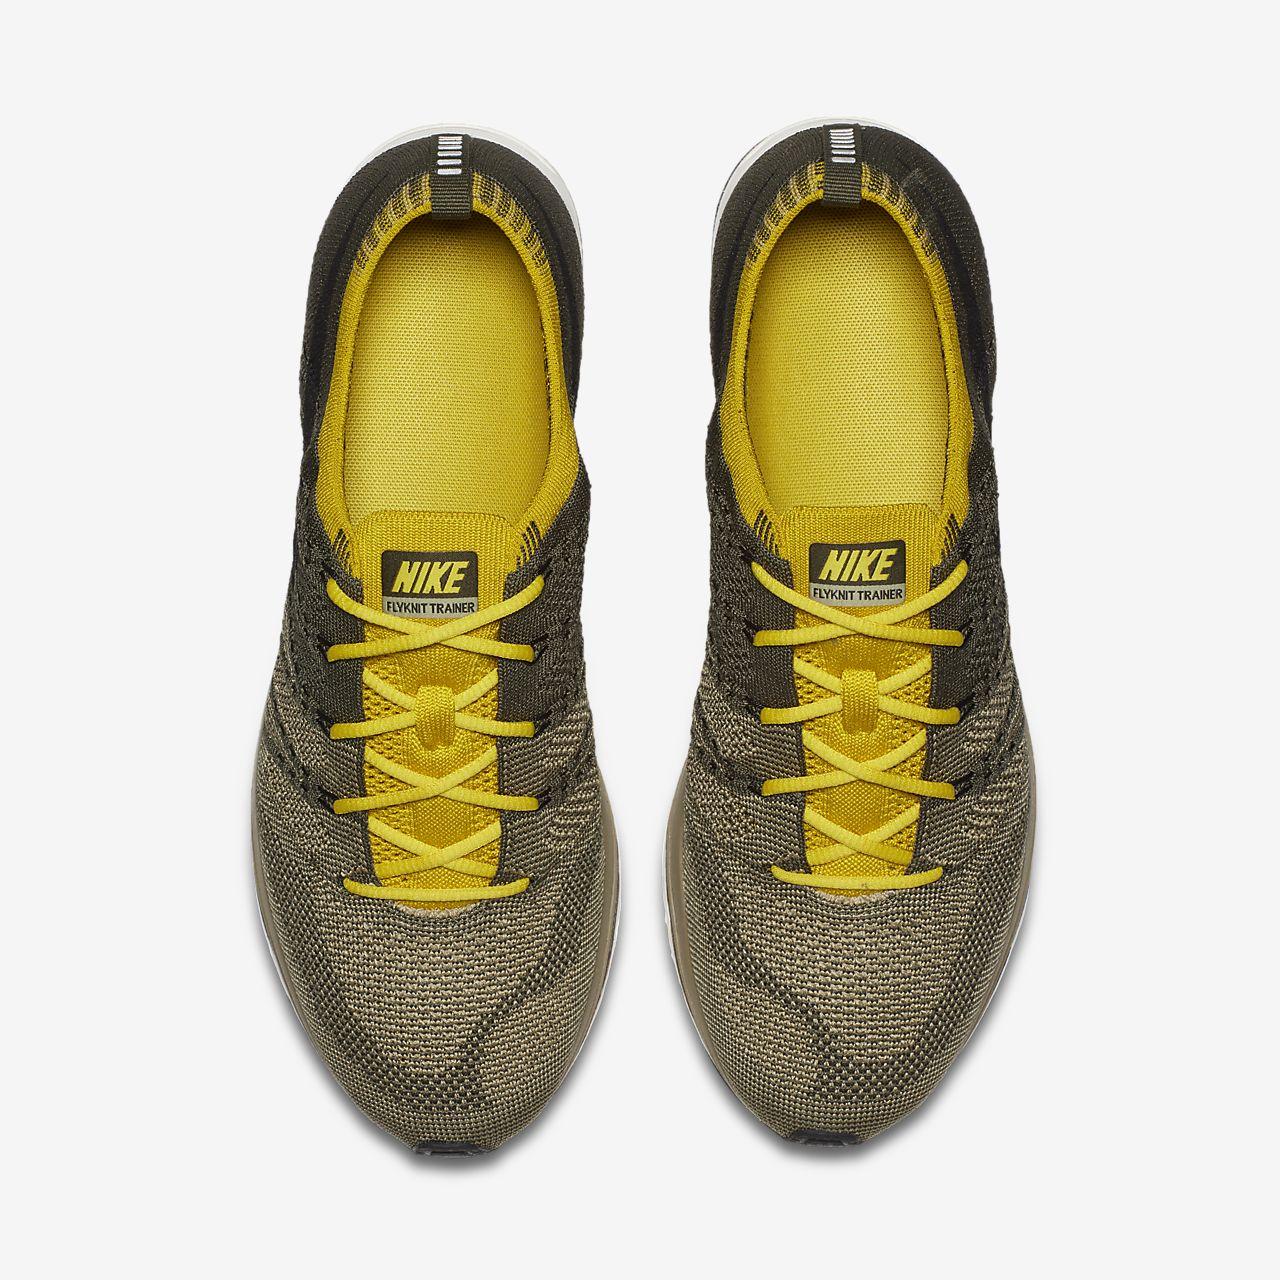 e9e9cf6470698 Nike Flyknit Trainer Unisex Shoe. Nike.com DK